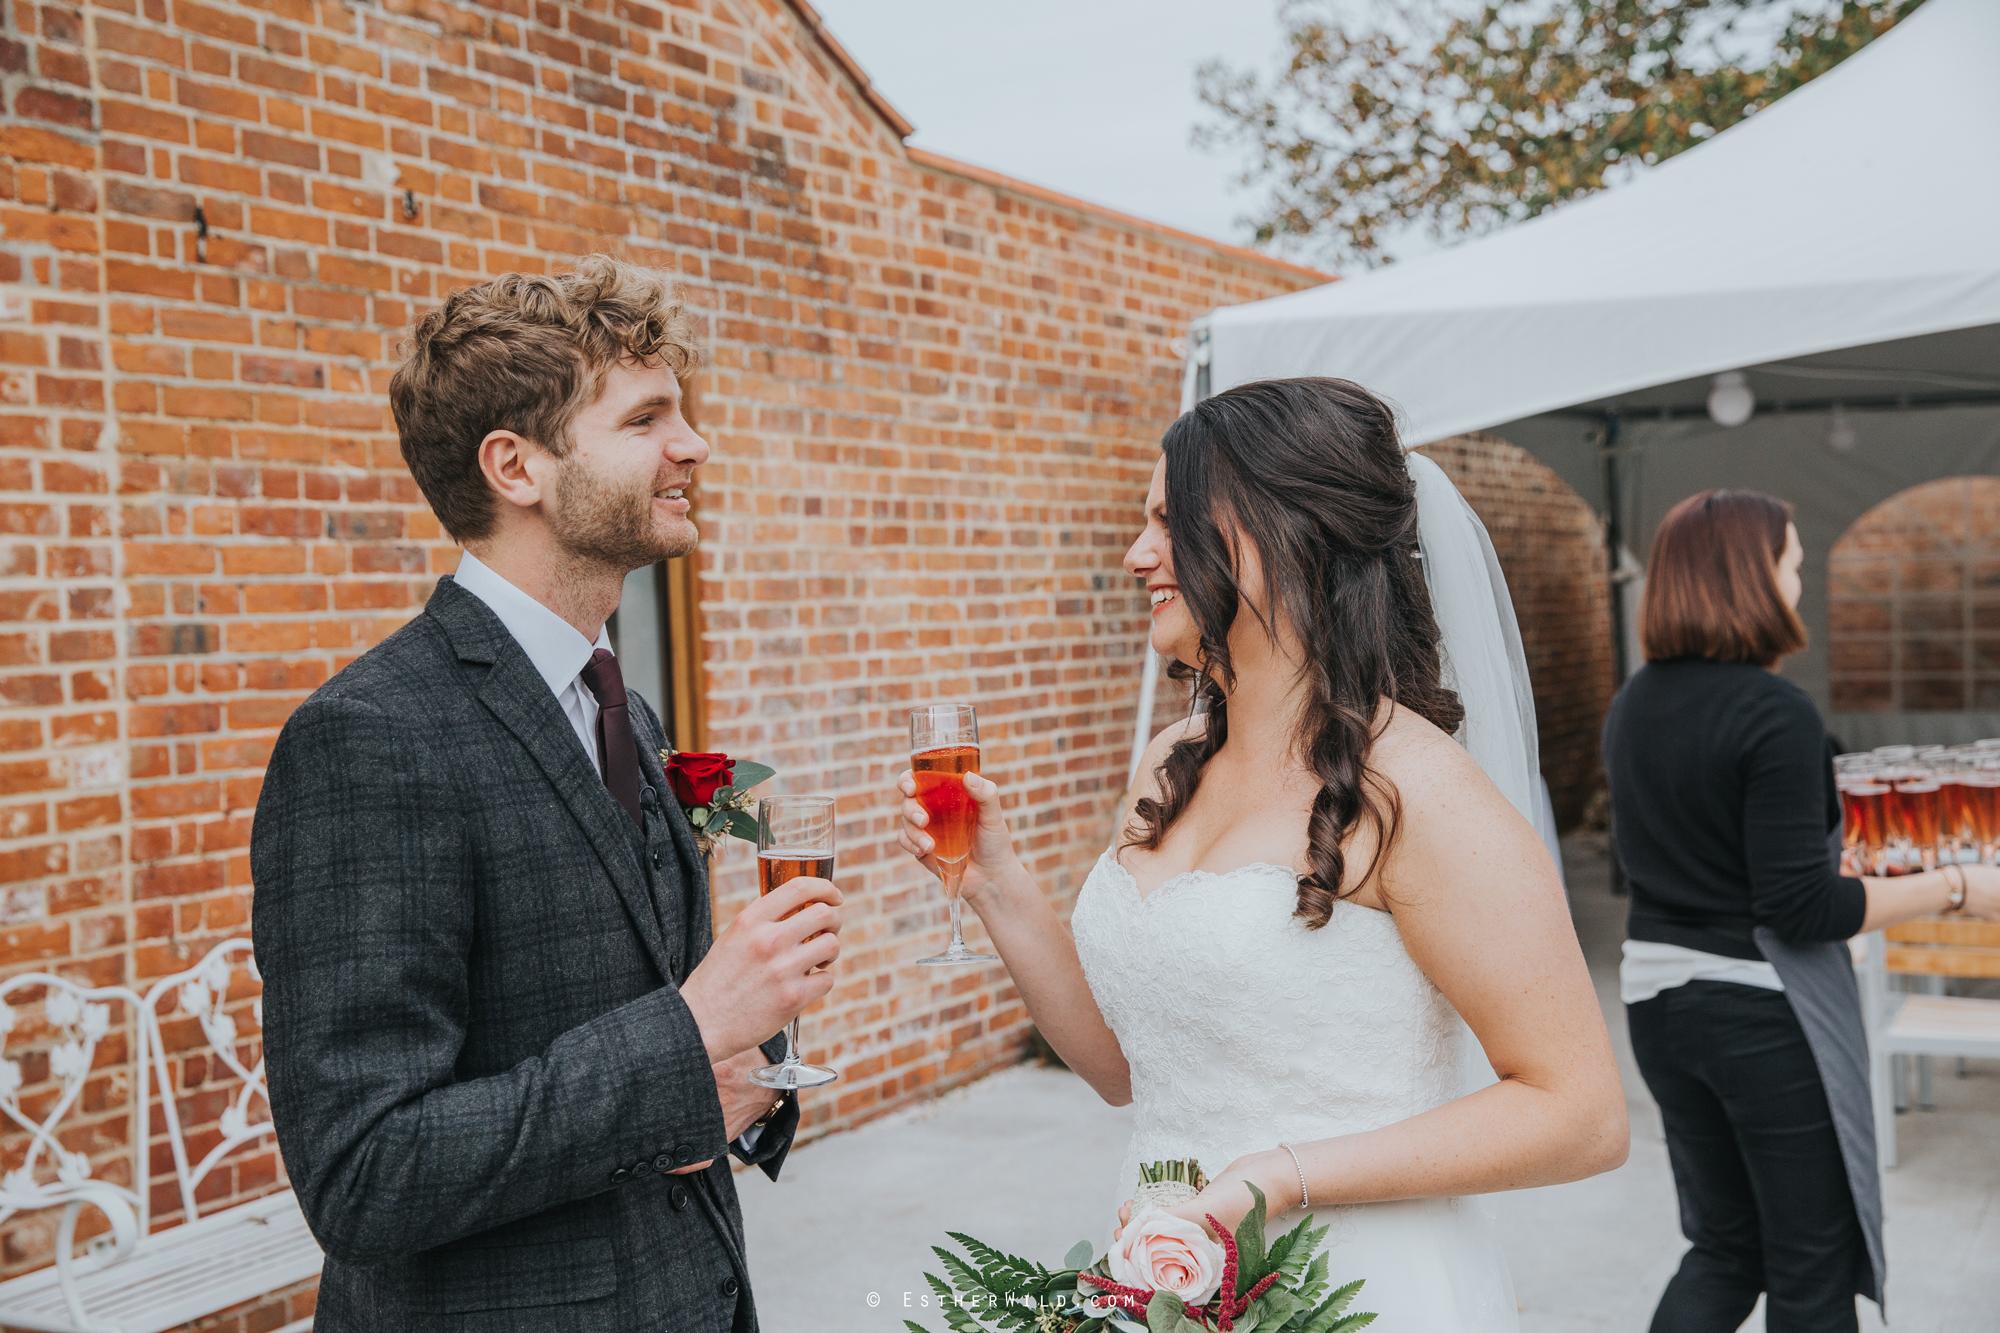 Reading_Room_Weddings_Alby_Norwich_Photographer_Esther_Wild_IMG_1118.jpg